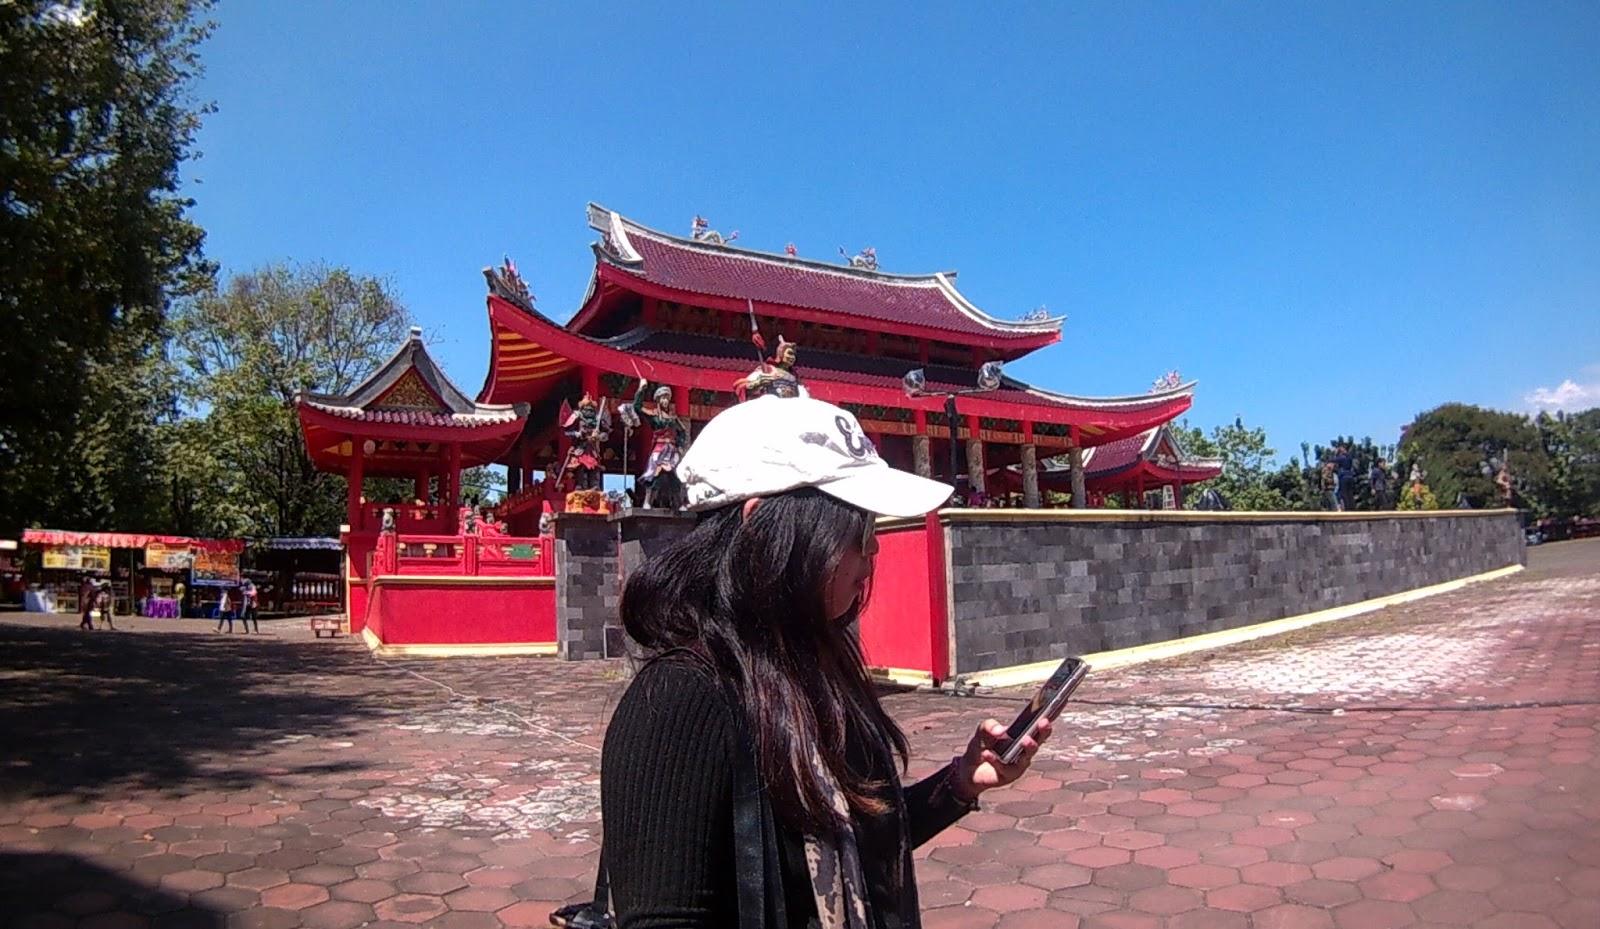 Indriani Blog Explore Kota Kecil Semarang Jawa Tengah Komplek Klenteng